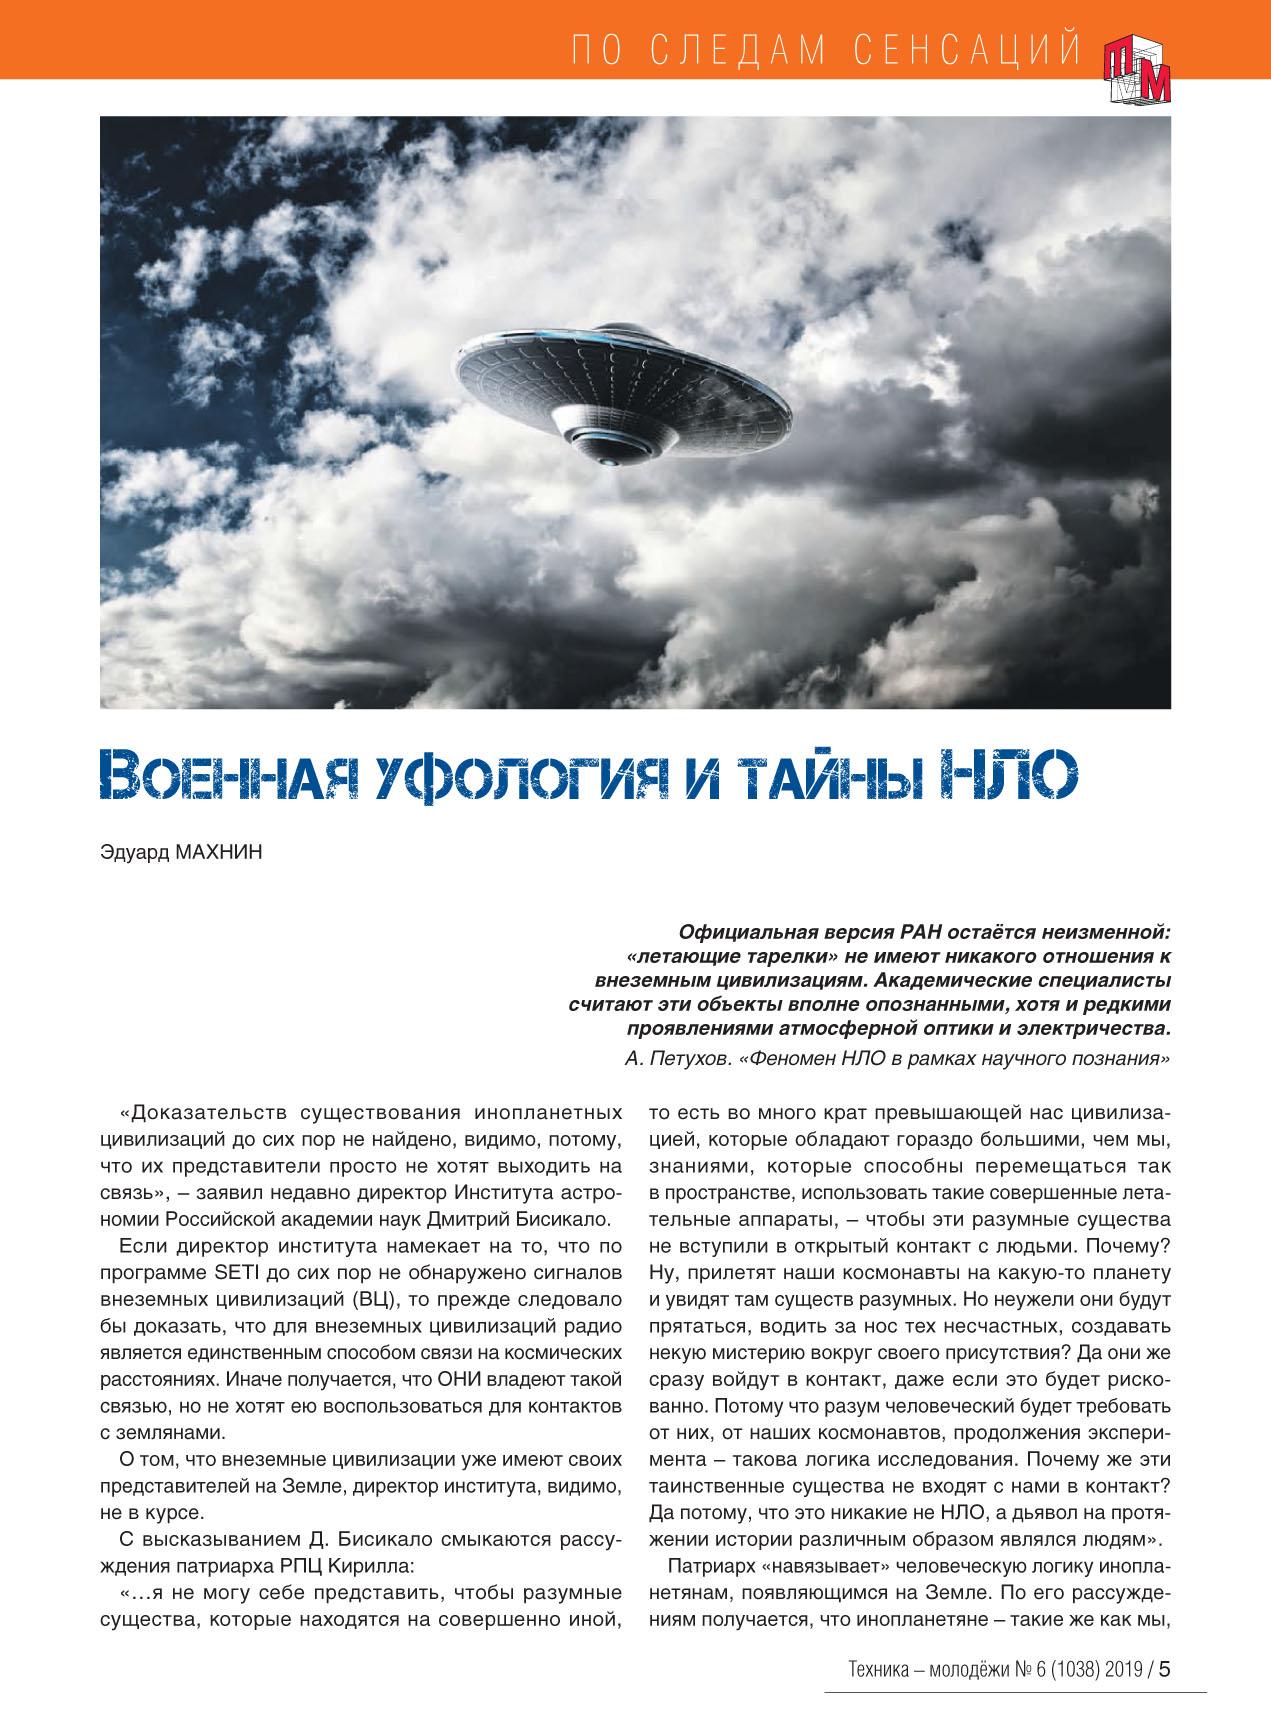 TM 2019-06 UFO 02.jpg